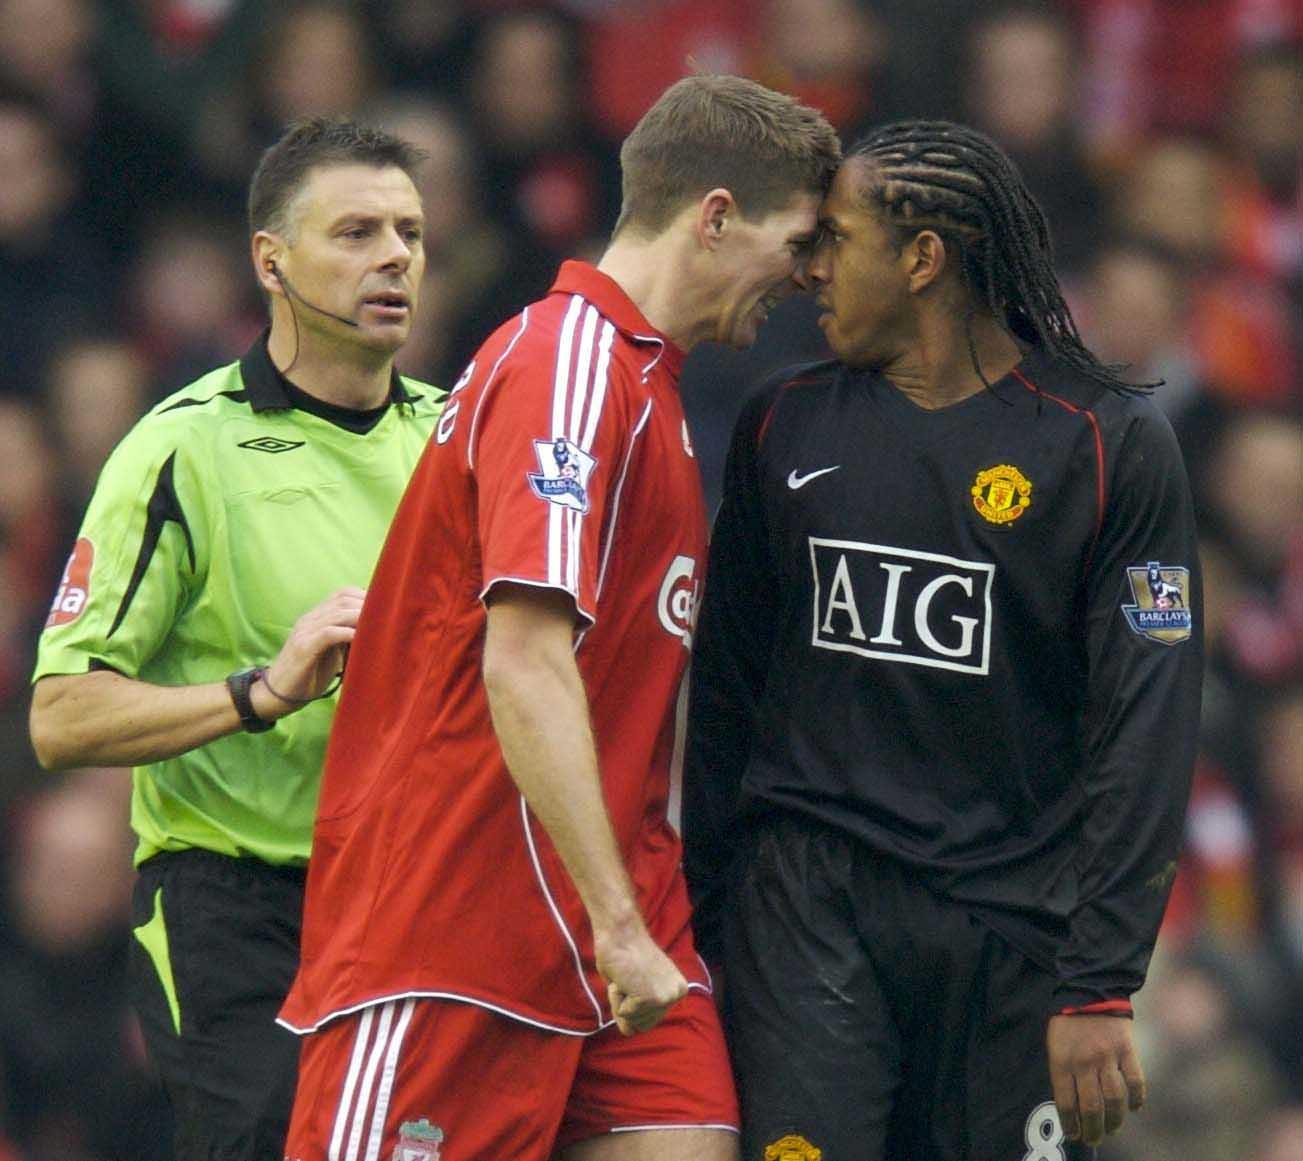 Liverpool Vs Man Utd U19s Result: FOOTBALL ISN'T 'THE BEAUTIFUL GAME'